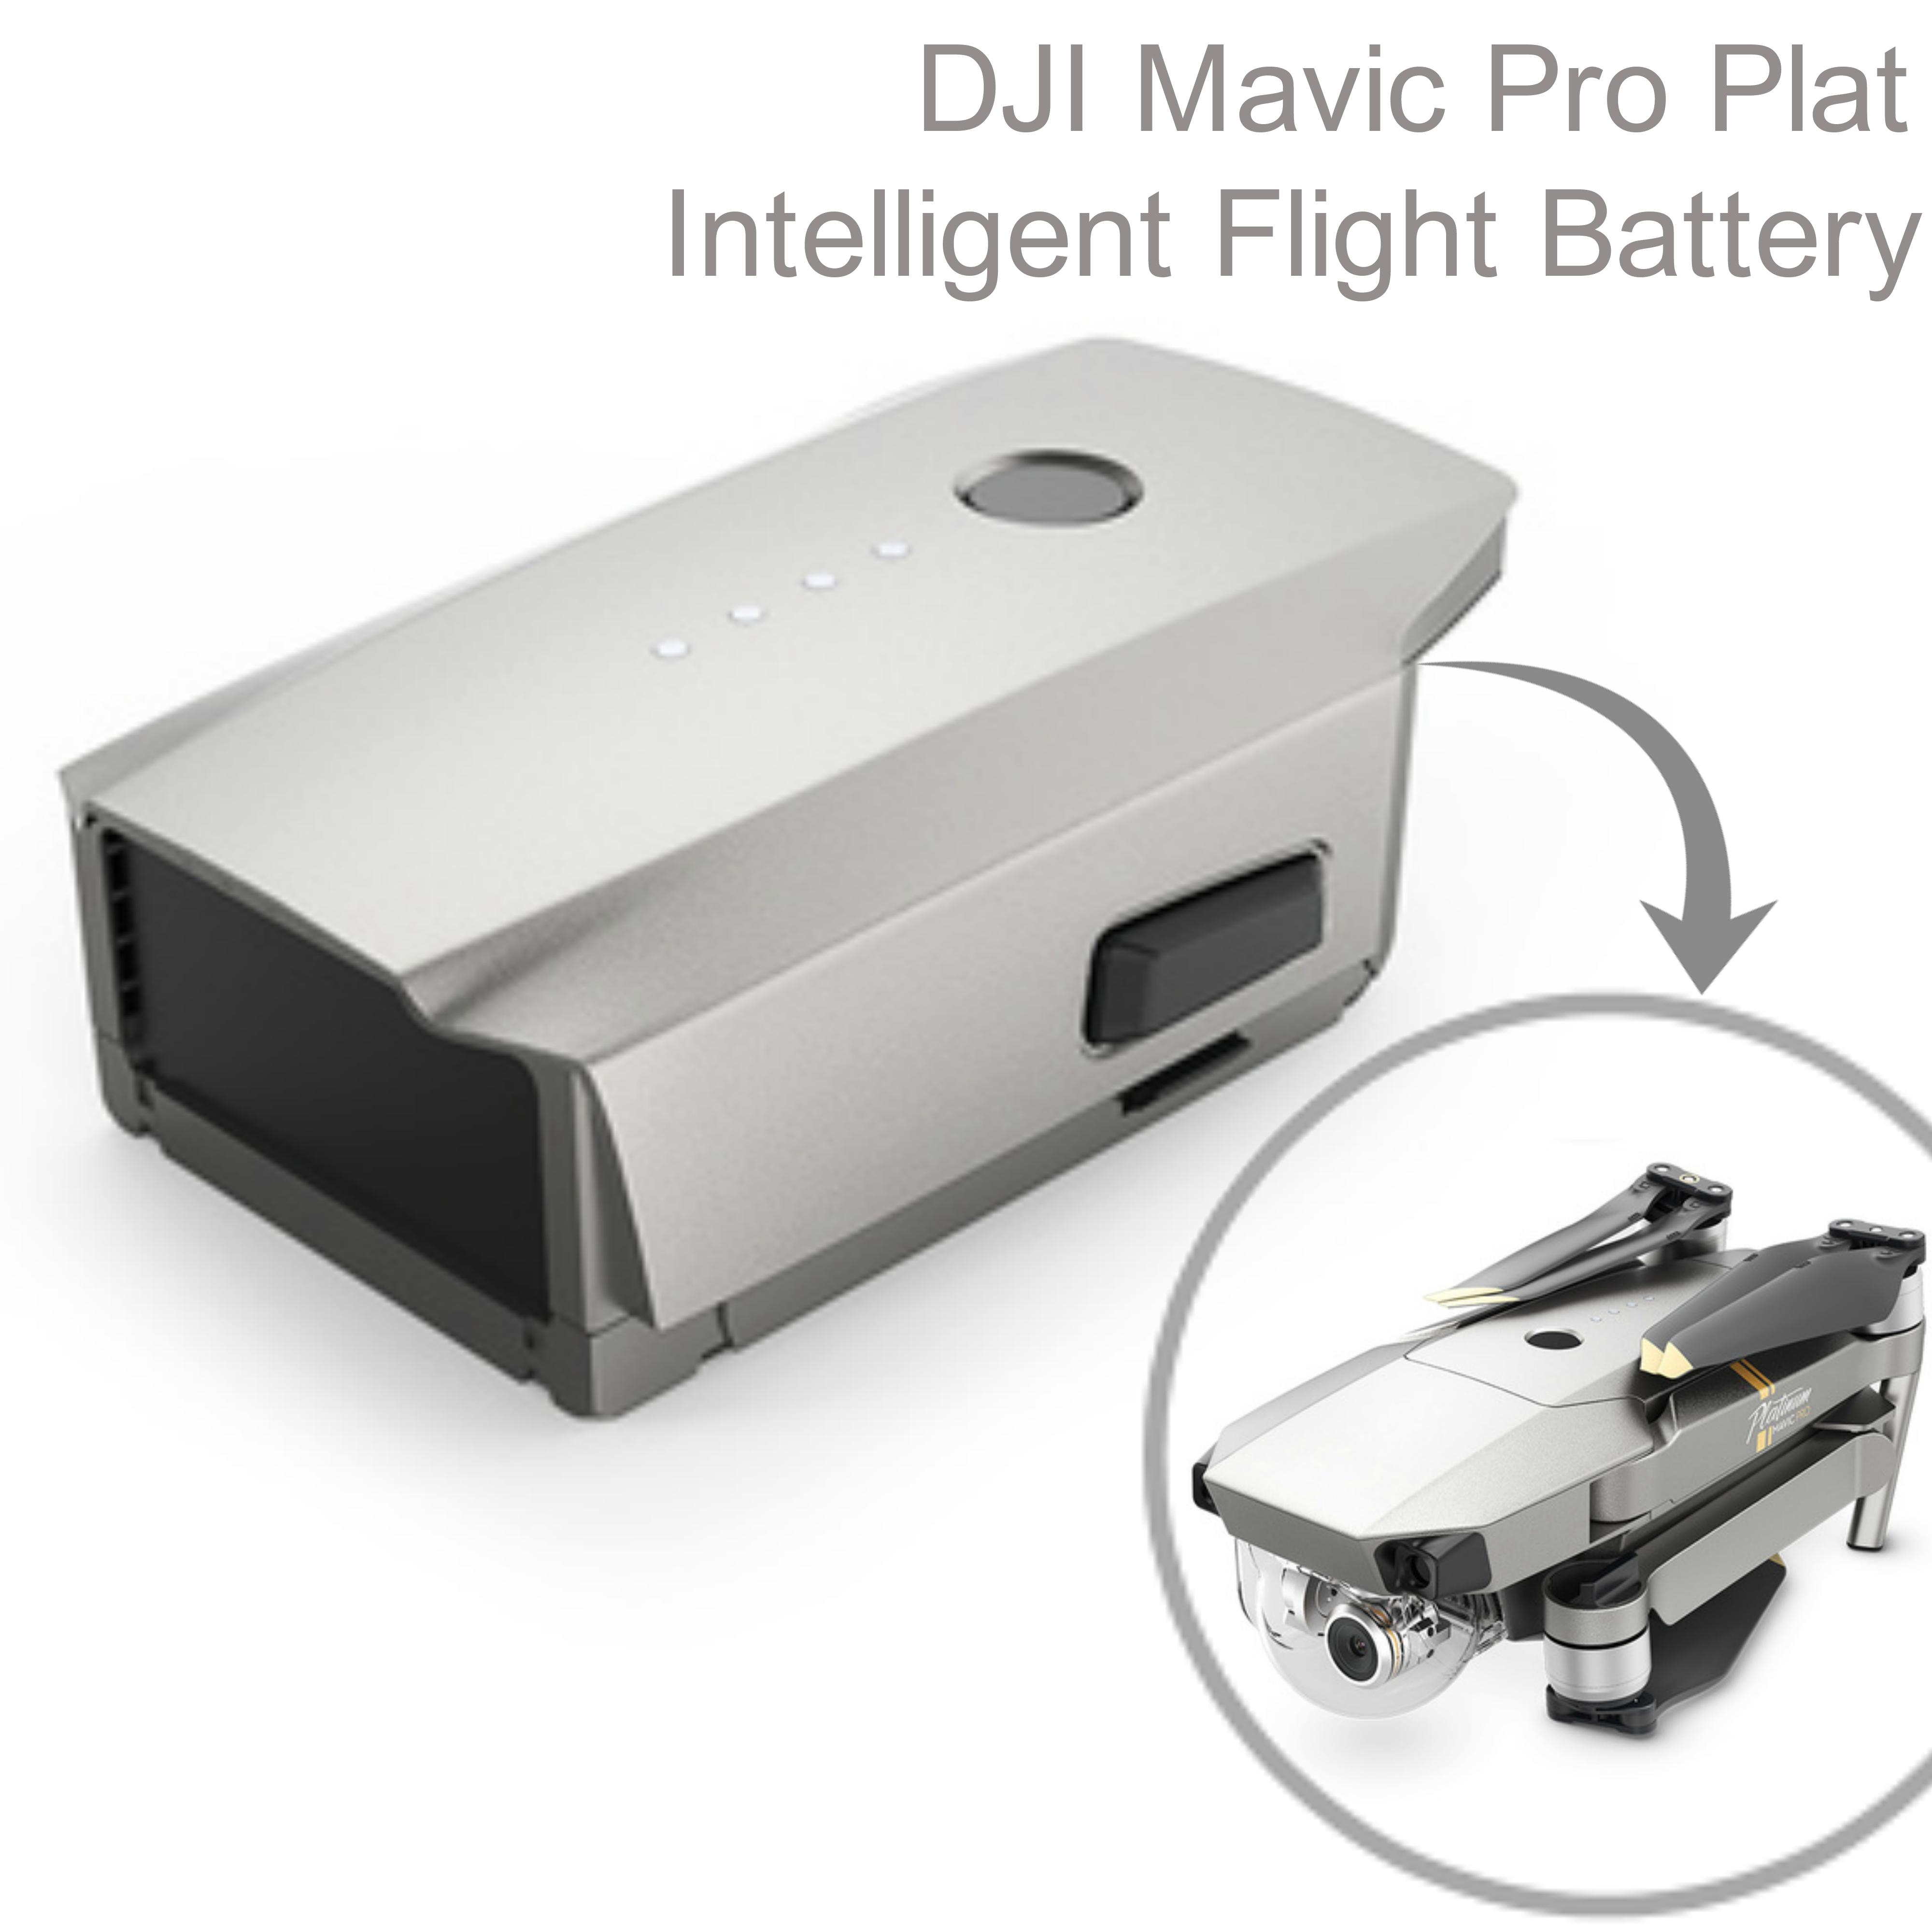 DJI Mavic Pro Platinum Drone Intelligent Flight Battery|3830 mAh|CP.PT.00073.01